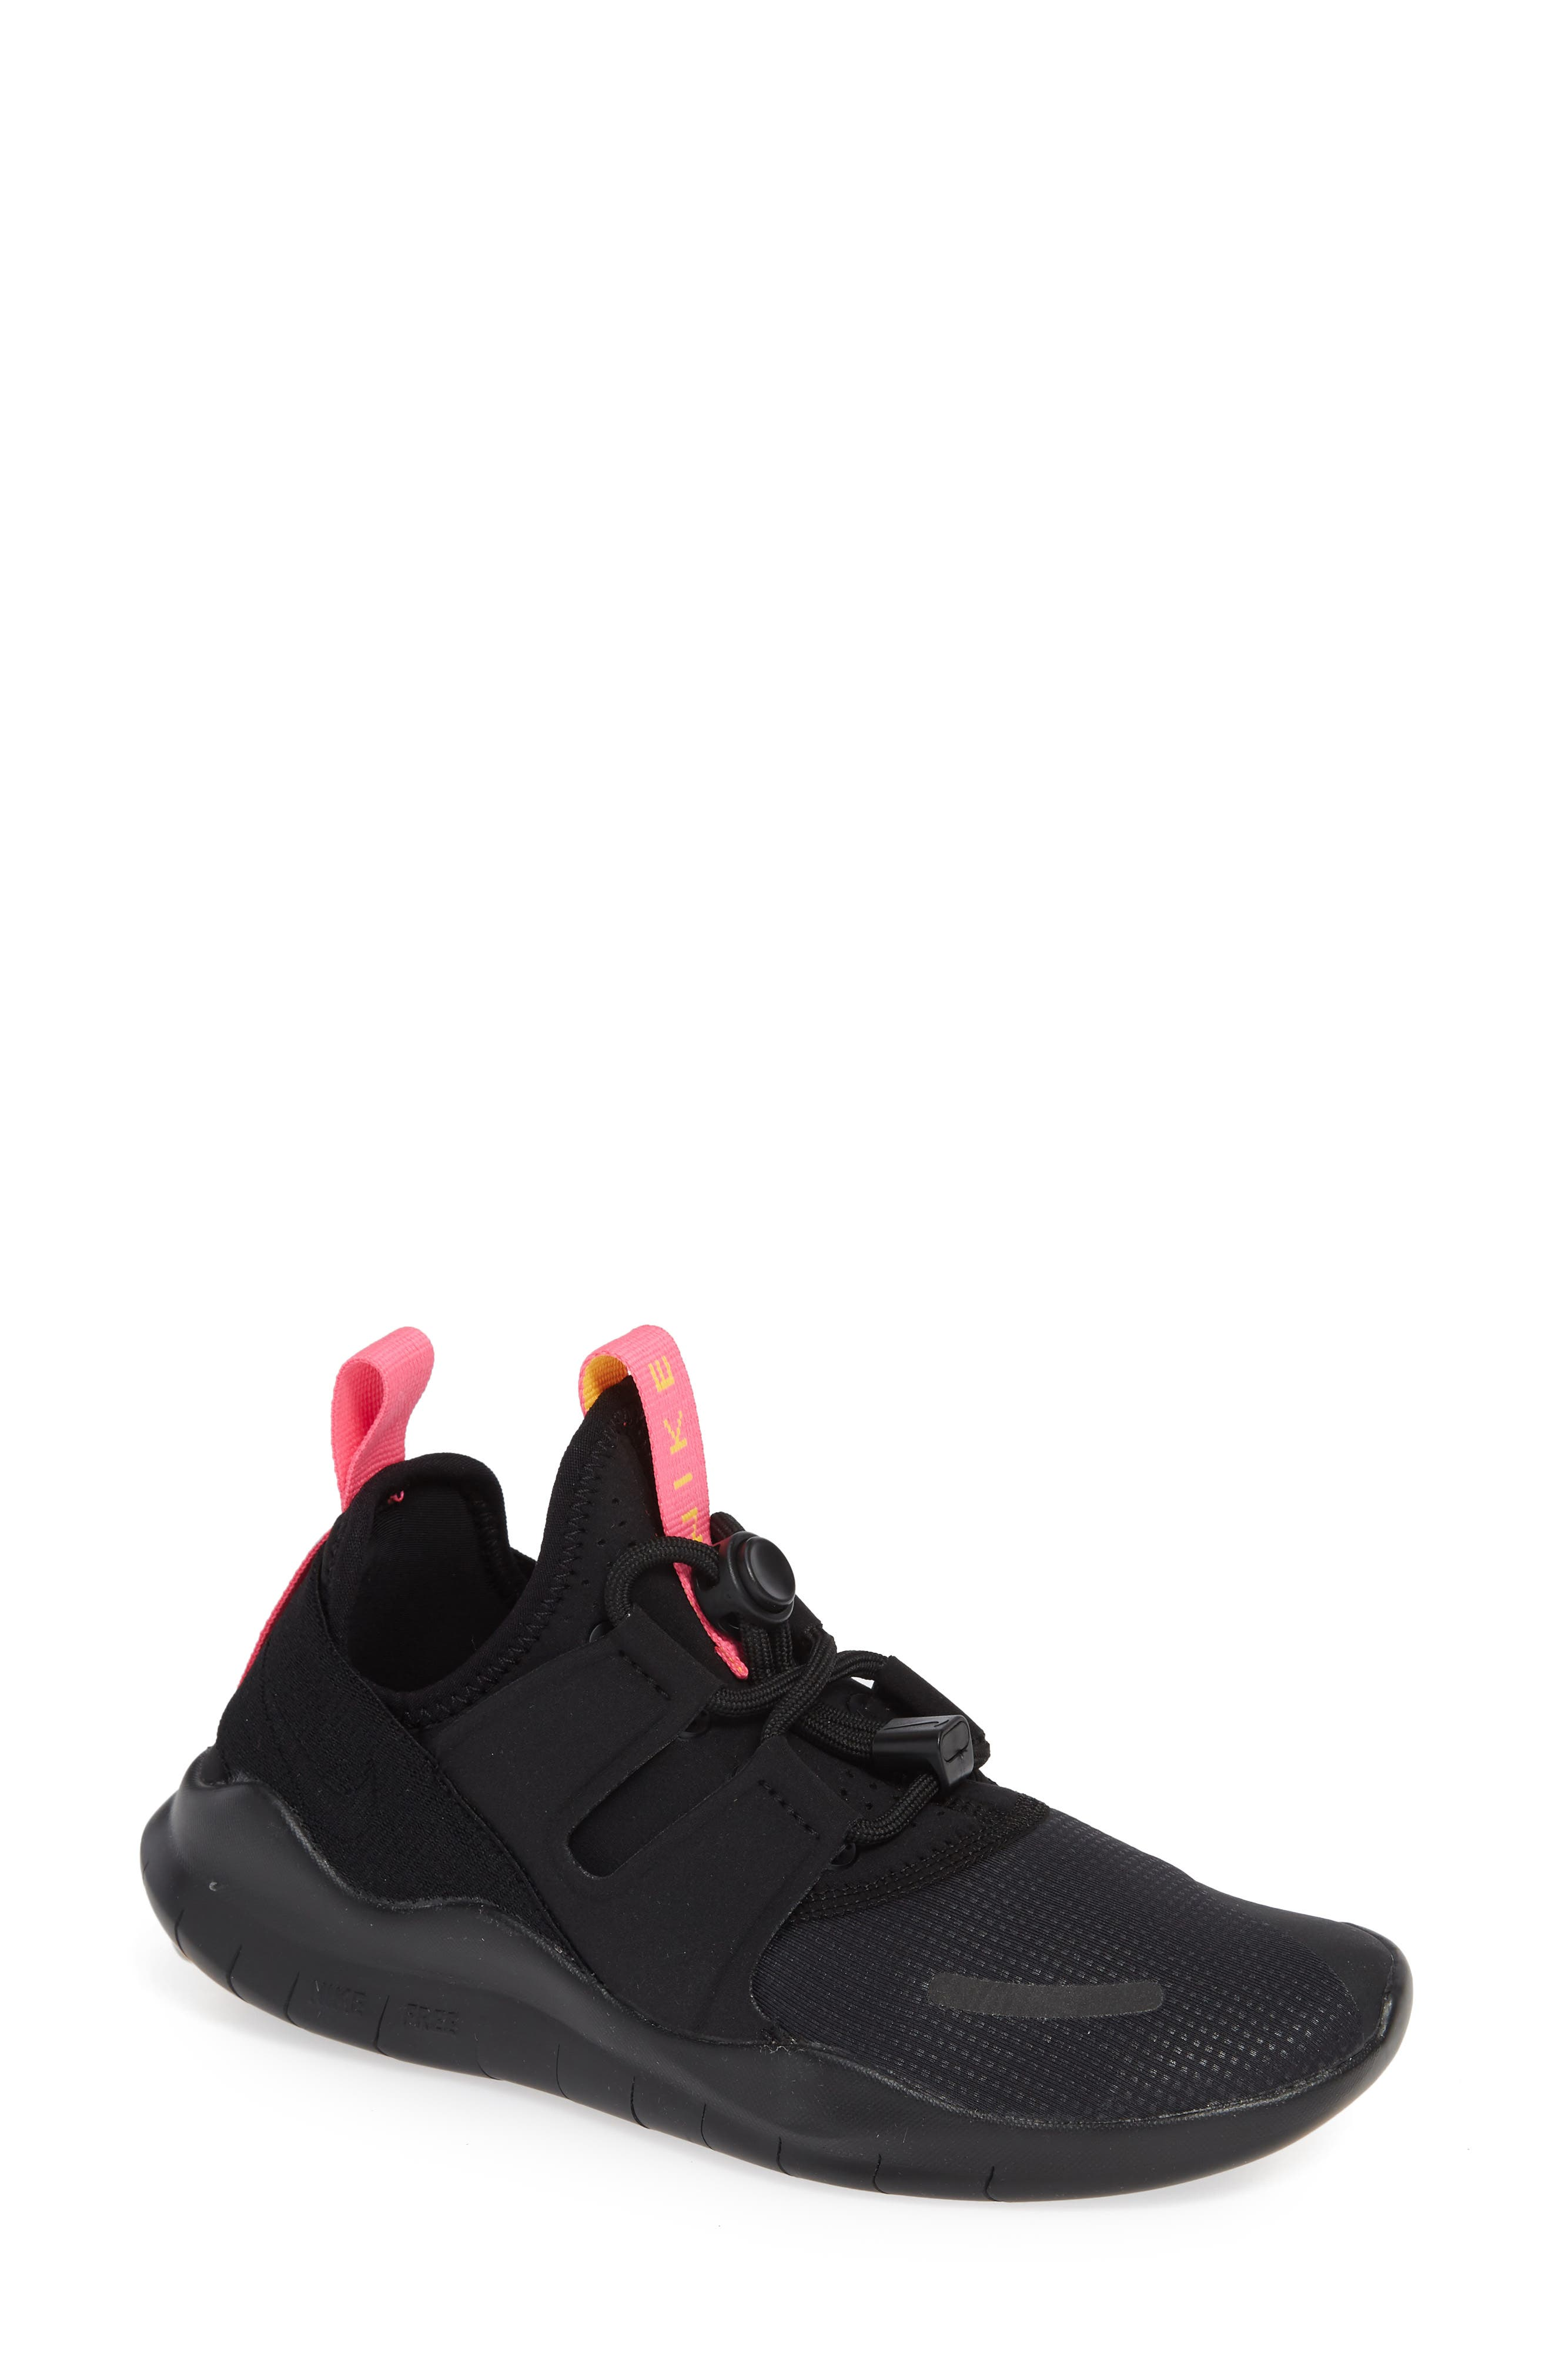 Free RN Commuter 2018 Running Shoe,                         Main,                         color, BLACK/ PINK BLAST/ ORANGE